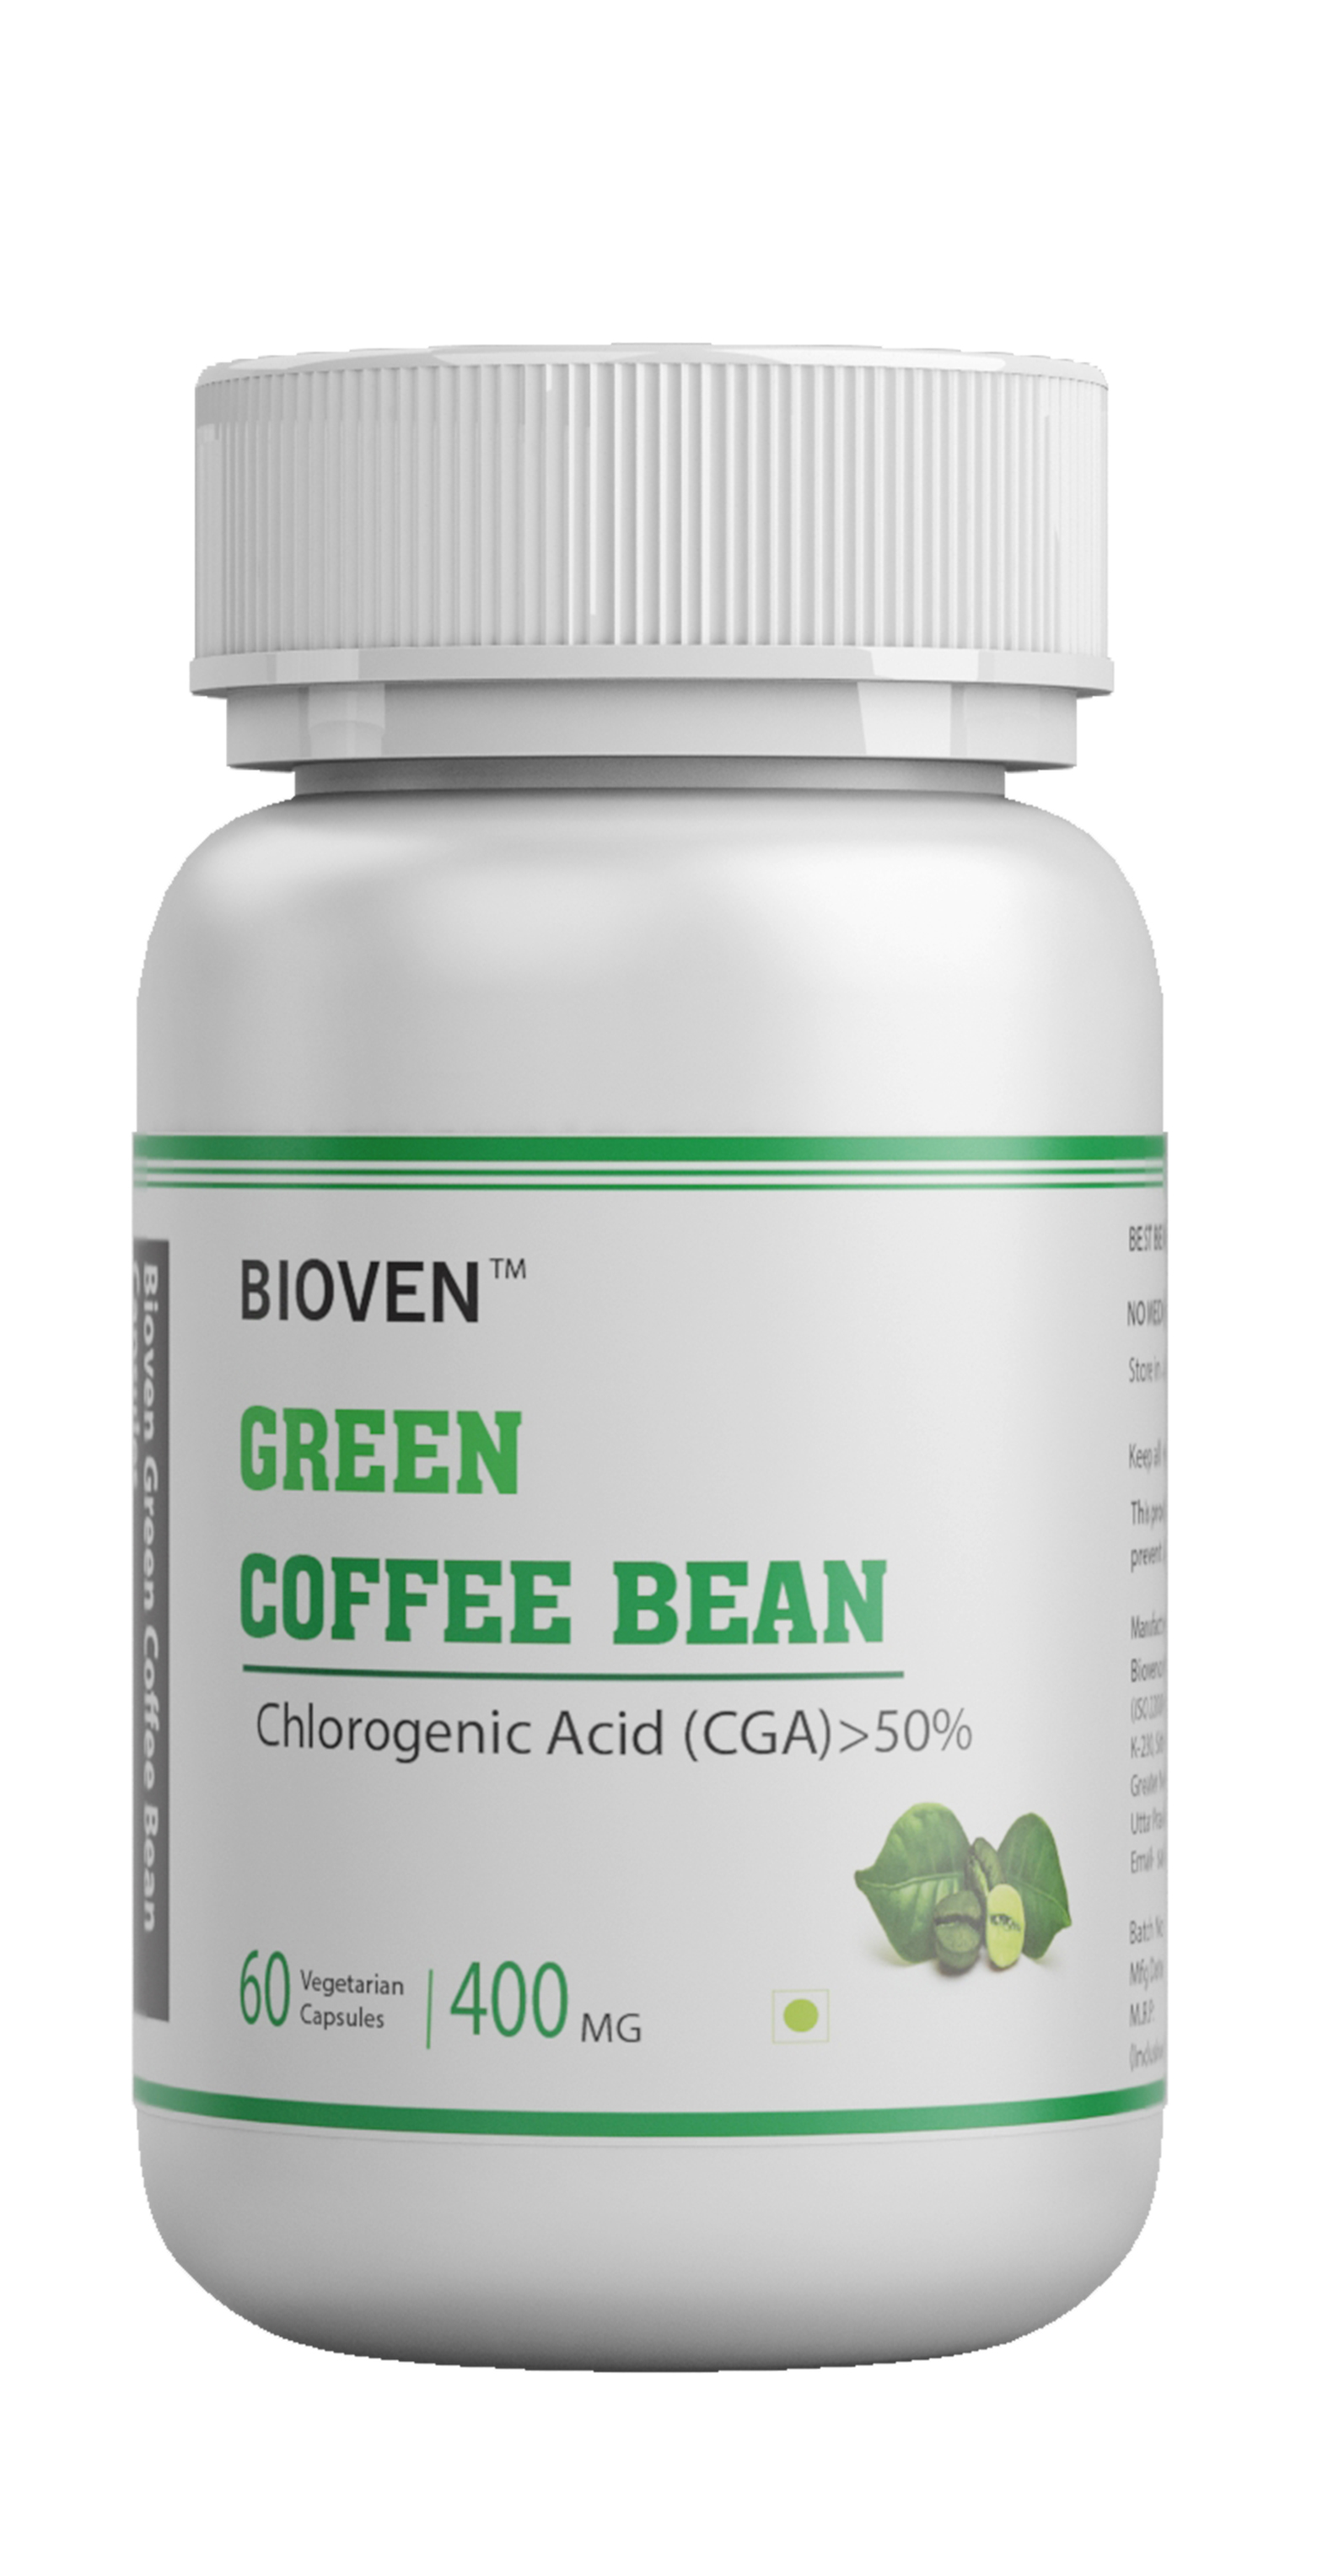 Green Coffee Bean Extract Veg Capsules